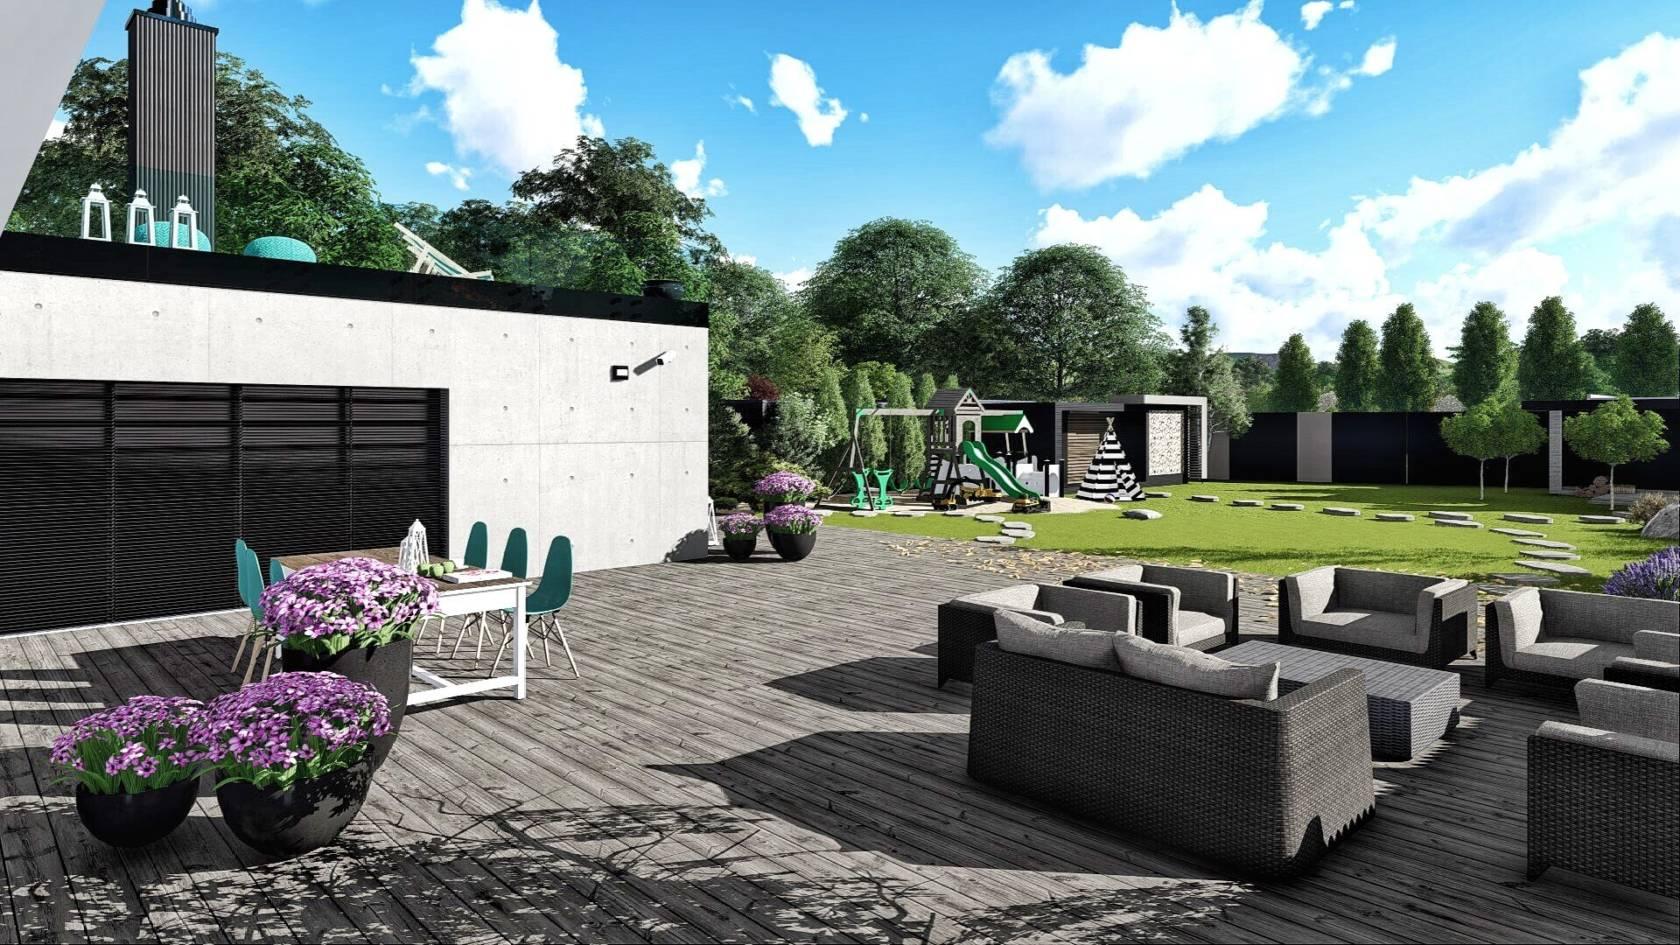 Projekt zahrada Kosice 03